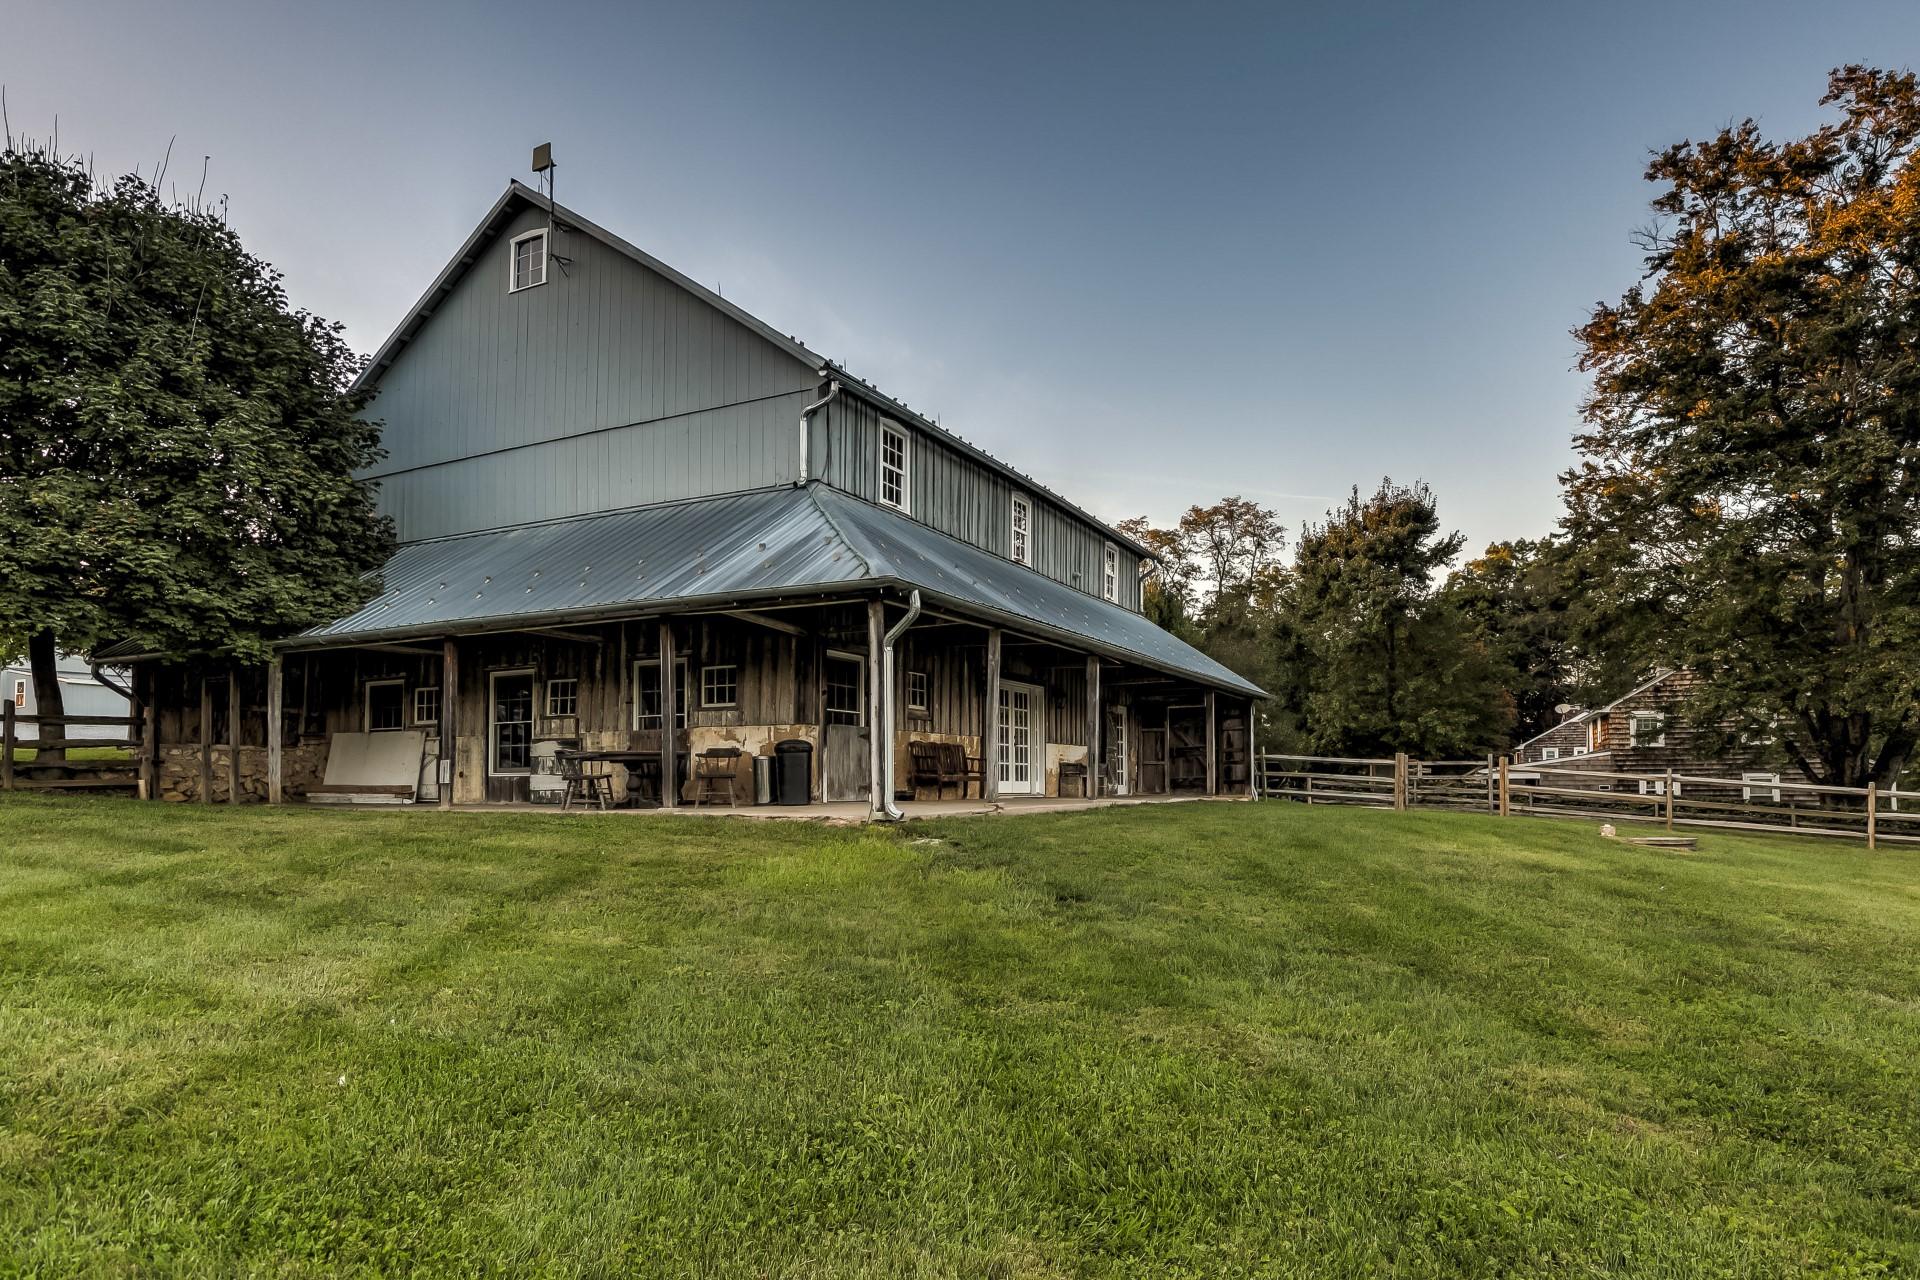 4021 Hess Rd, Monkton, Maryland 21111, 11 Bedrooms Bedrooms, ,5 BathroomsBathrooms,Farm,For Sale,Hess,1010000333